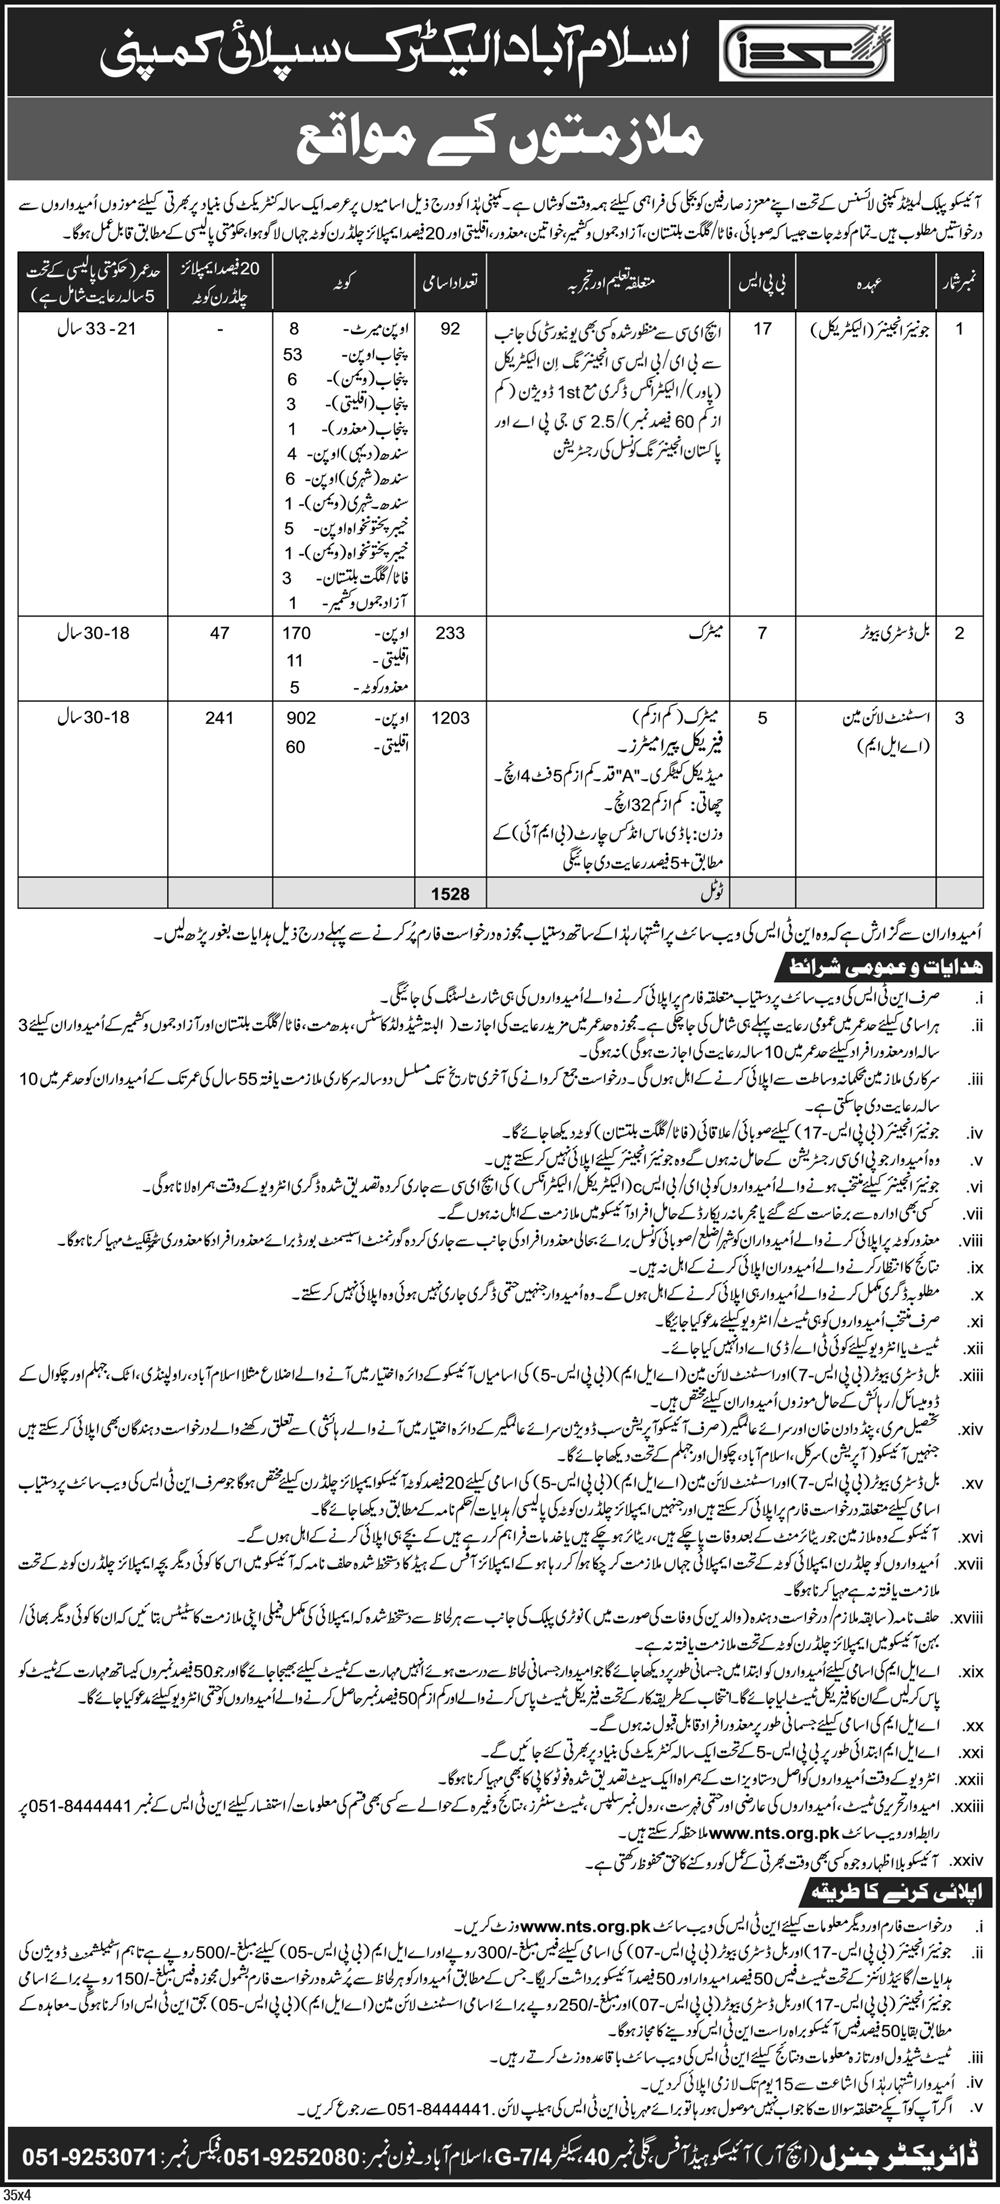 Islamabad Electric Supply Company LESCO Jobs 2019 application form Eligibility Criteria